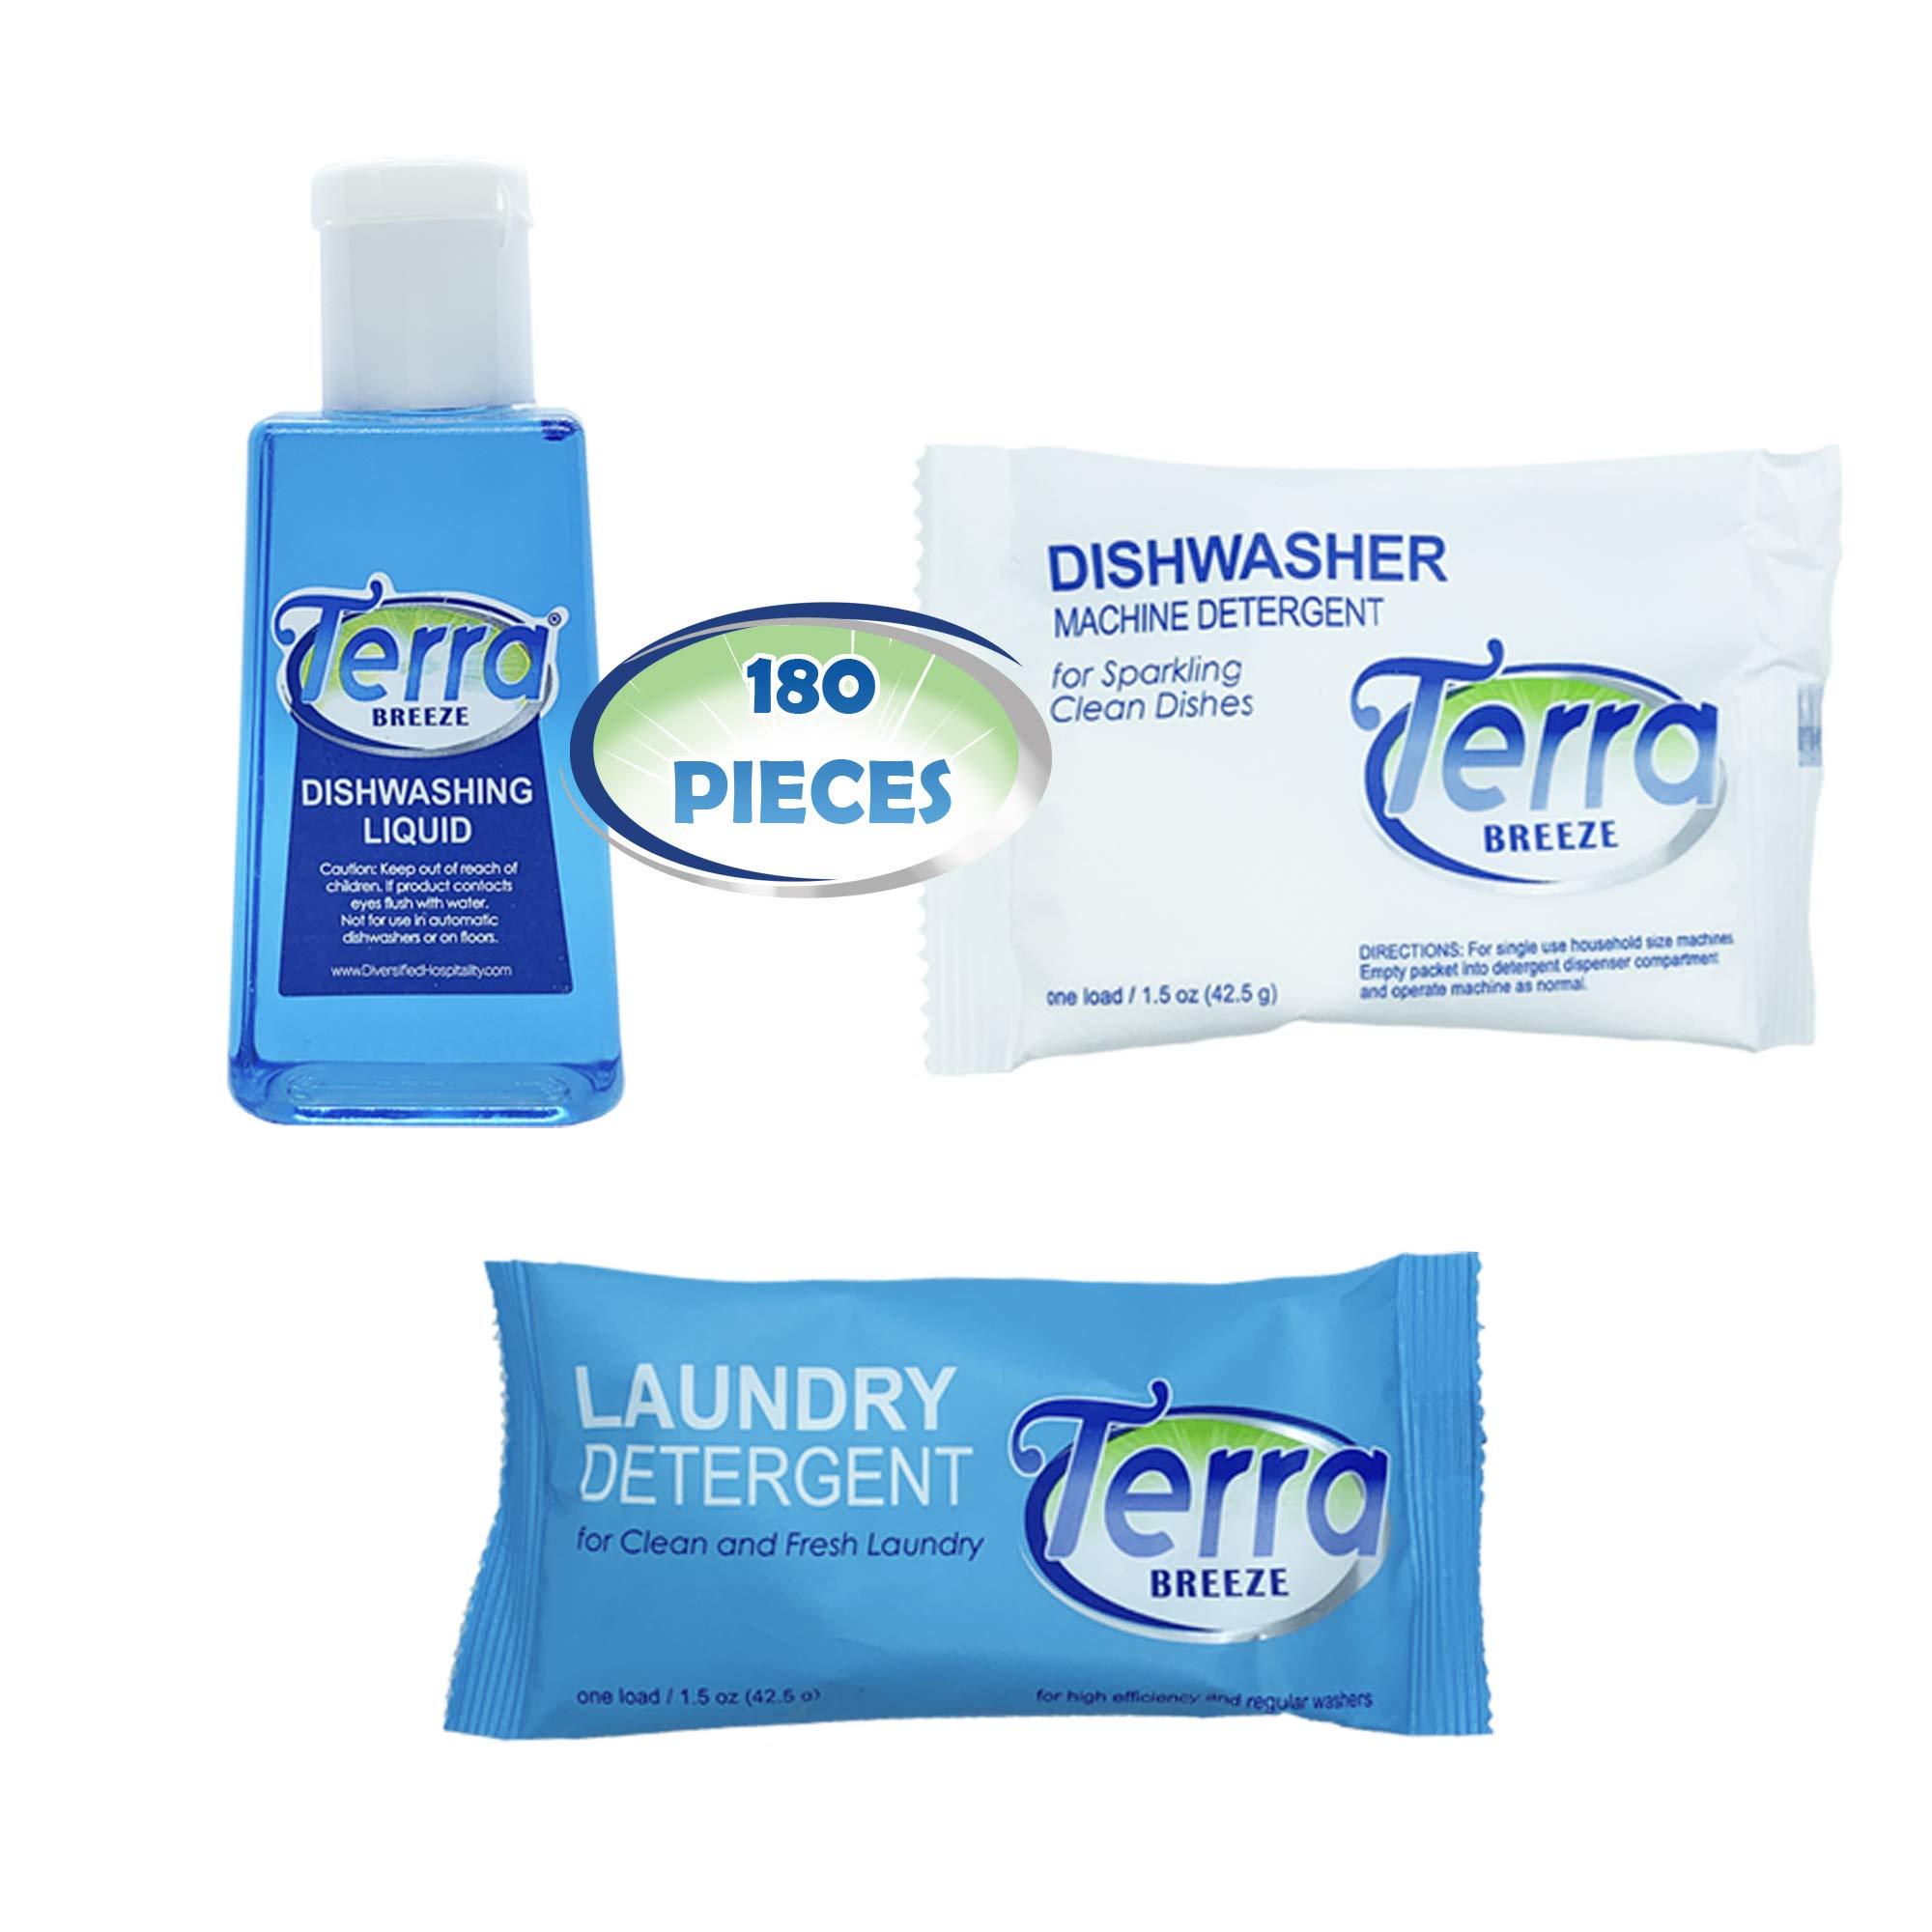 Travel Laundry Detergent & Dish Soap | Terra Breeze 1-Shoppe All-In-Kit Bulk Hotel Size Amenities for AirBnB & Rentals | Dishwashing Liquid, Dishwasher Detergent & Premeasured Laundry Soap | 180 Pcs